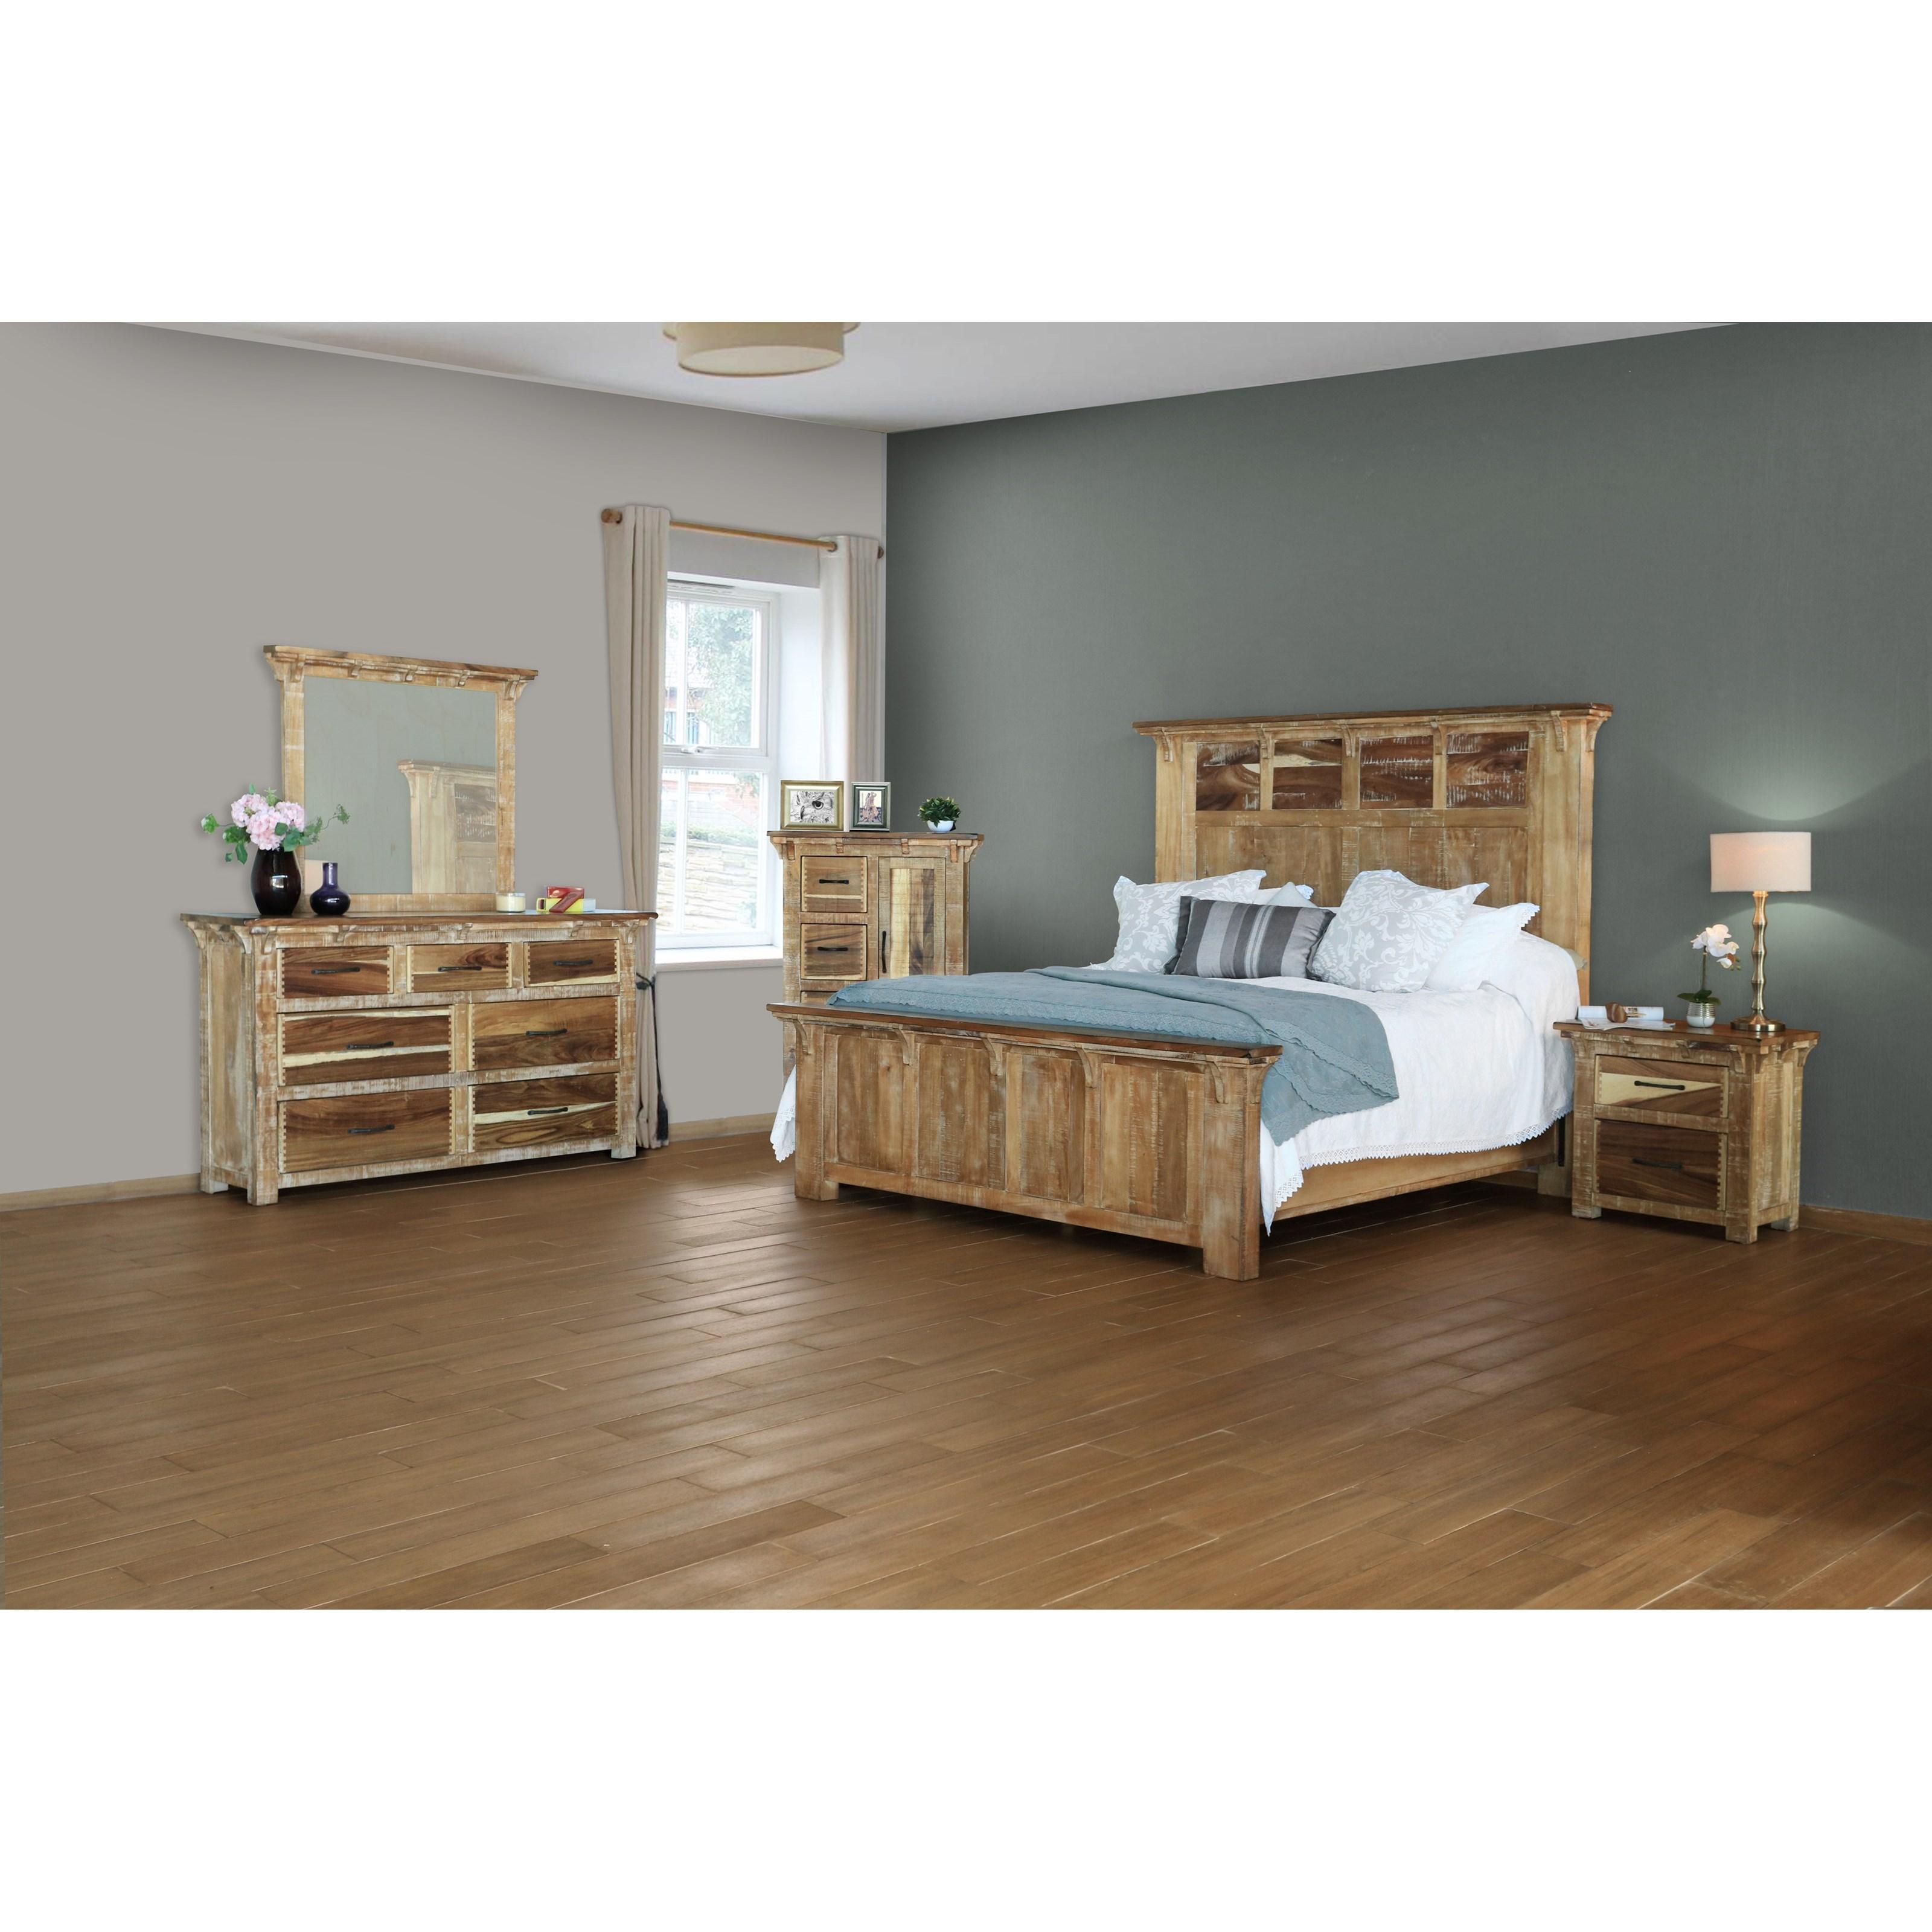 International furniture direct casablanca queen bedroom for Bedroom furniture direct